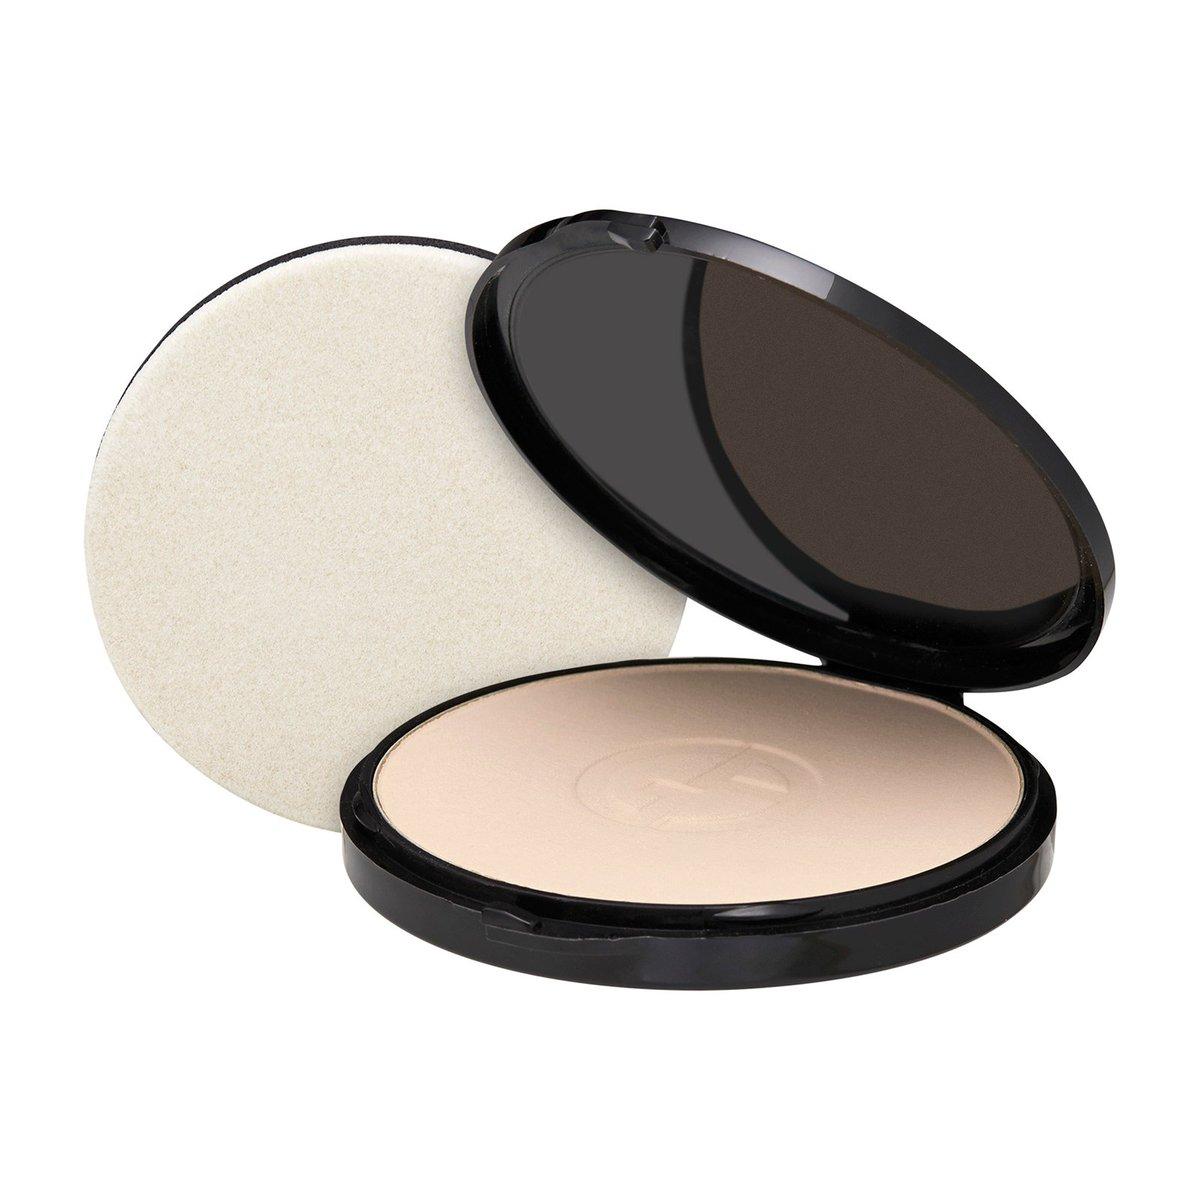 #Giorgio #Armani # #Luminous #Silk # at just $45.00 #Beauty #Essentials  #shop #ad #buy #product  http:// bit.ly/2oZdVbk  &nbsp;  <br>http://pic.twitter.com/WUocZTKAC4